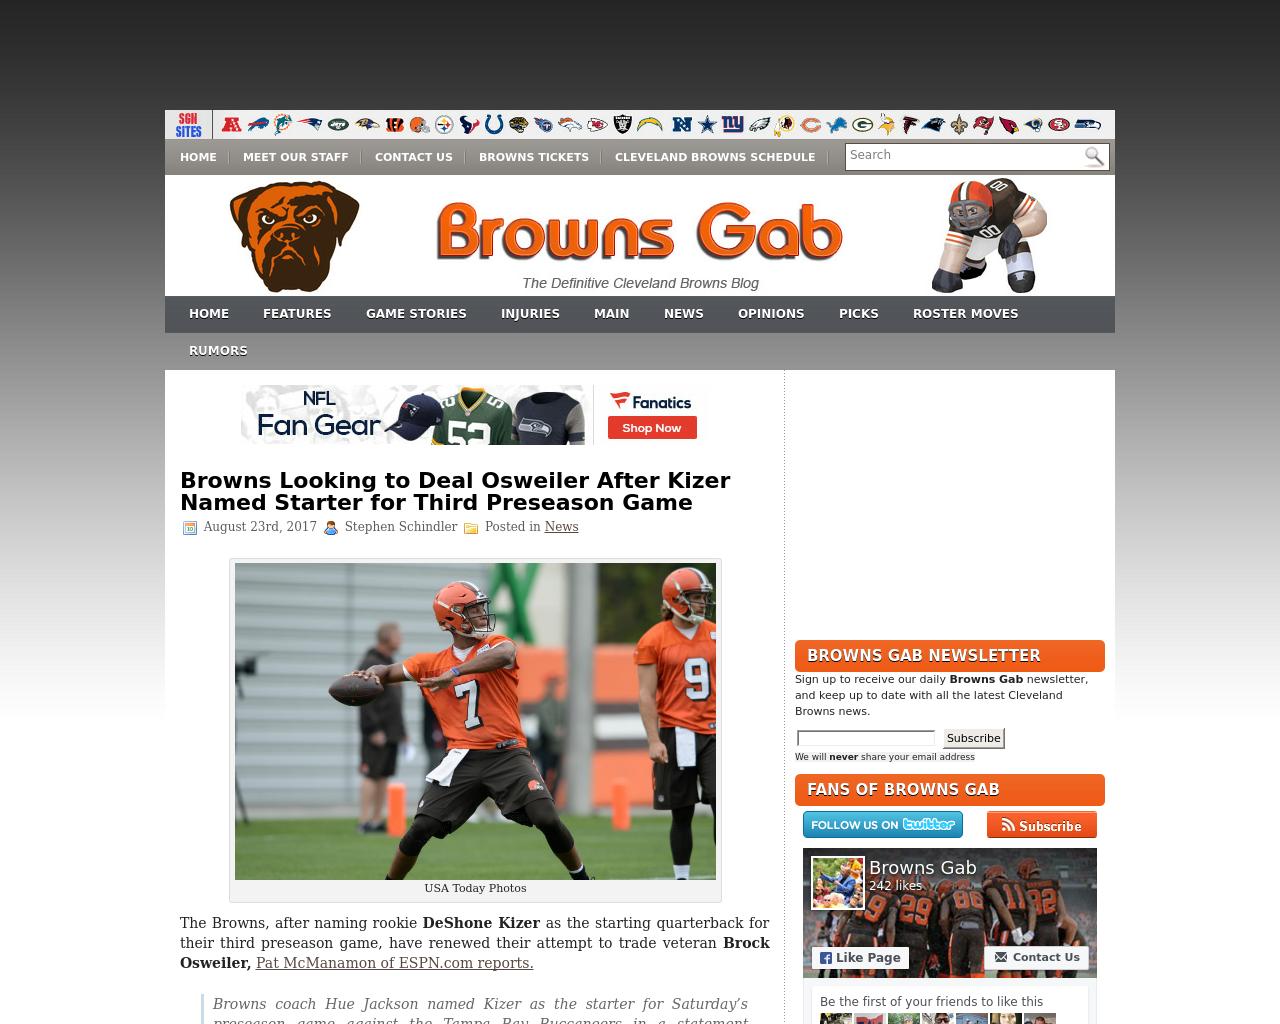 Browns-Gab-Advertising-Reviews-Pricing